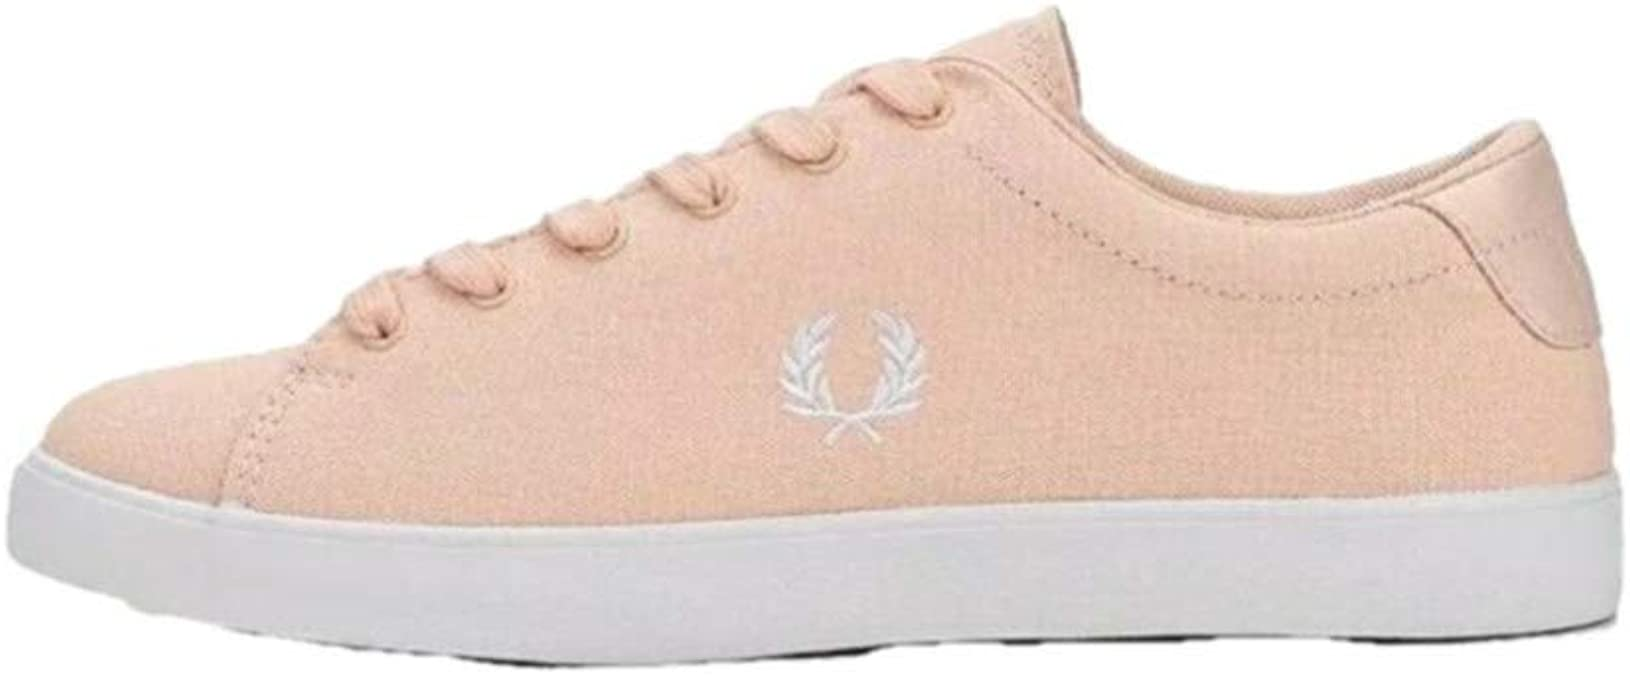 Shoes Woman B5154W Lottie H24 Coral